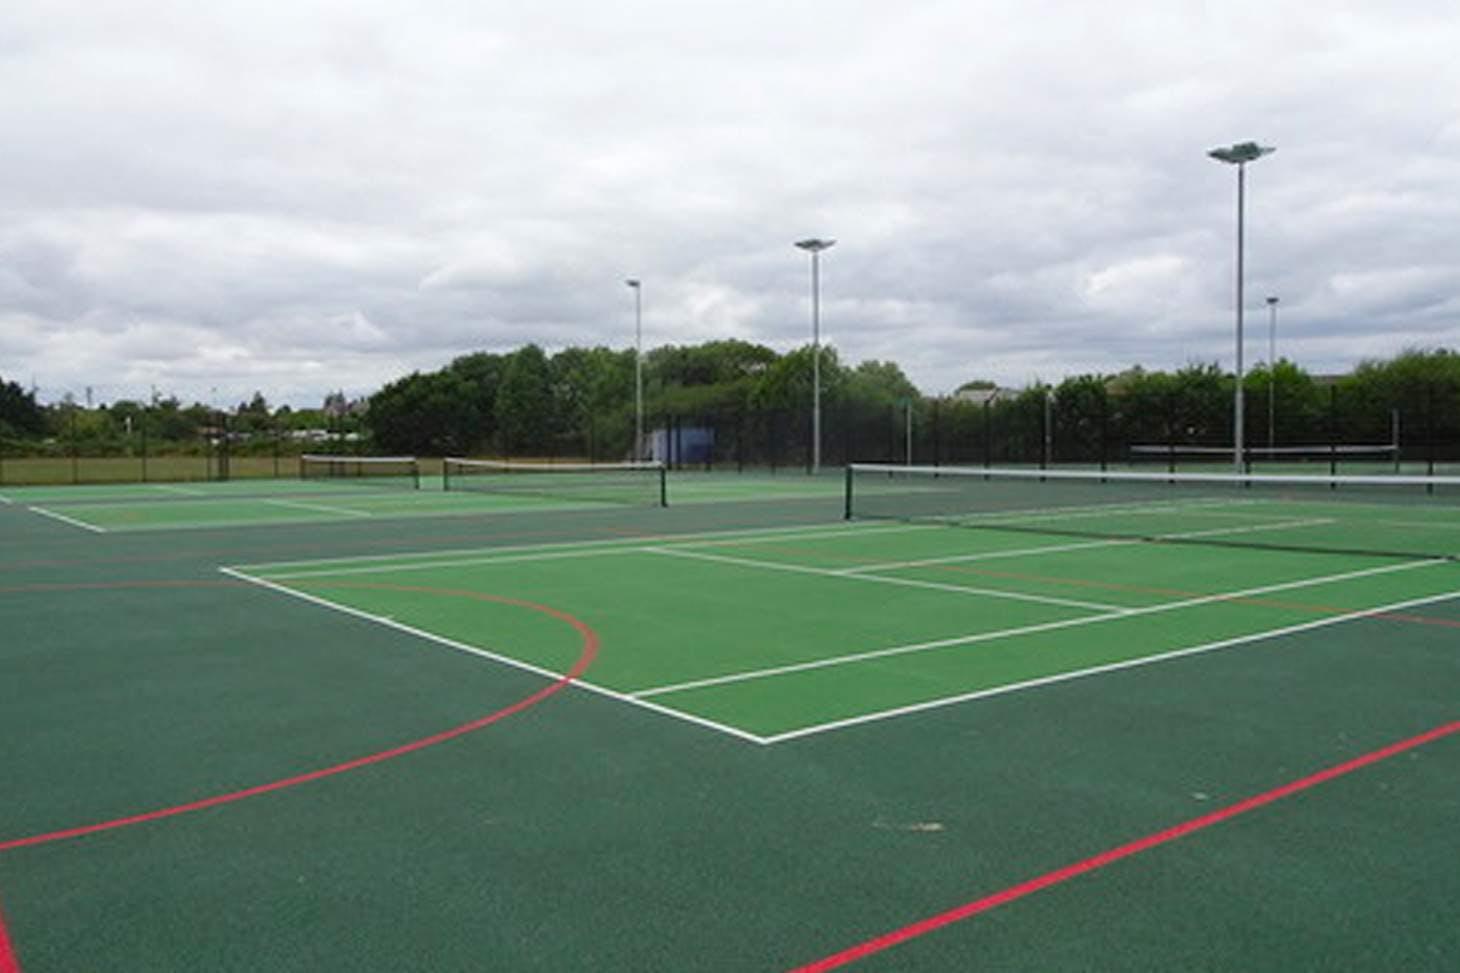 Trevelyan Middle School Outdoor | Hard (macadam) netball court